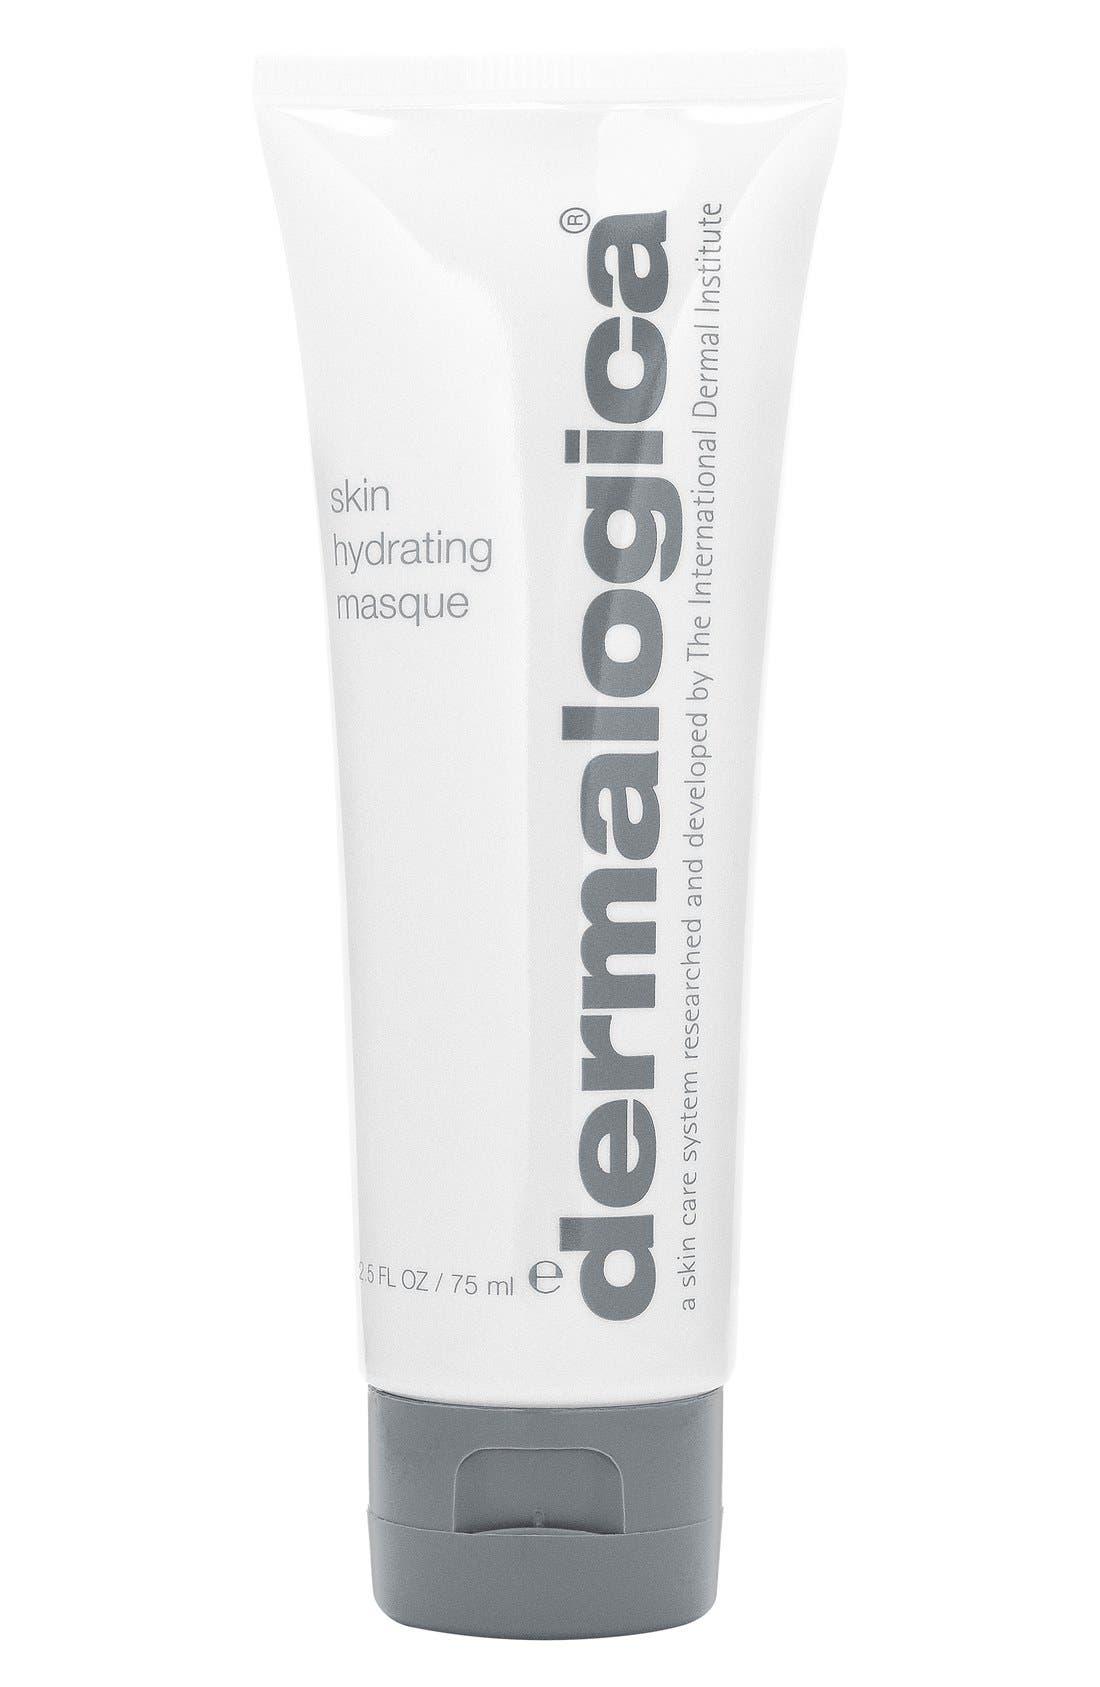 dermalogica® Skin Hydrating Masque